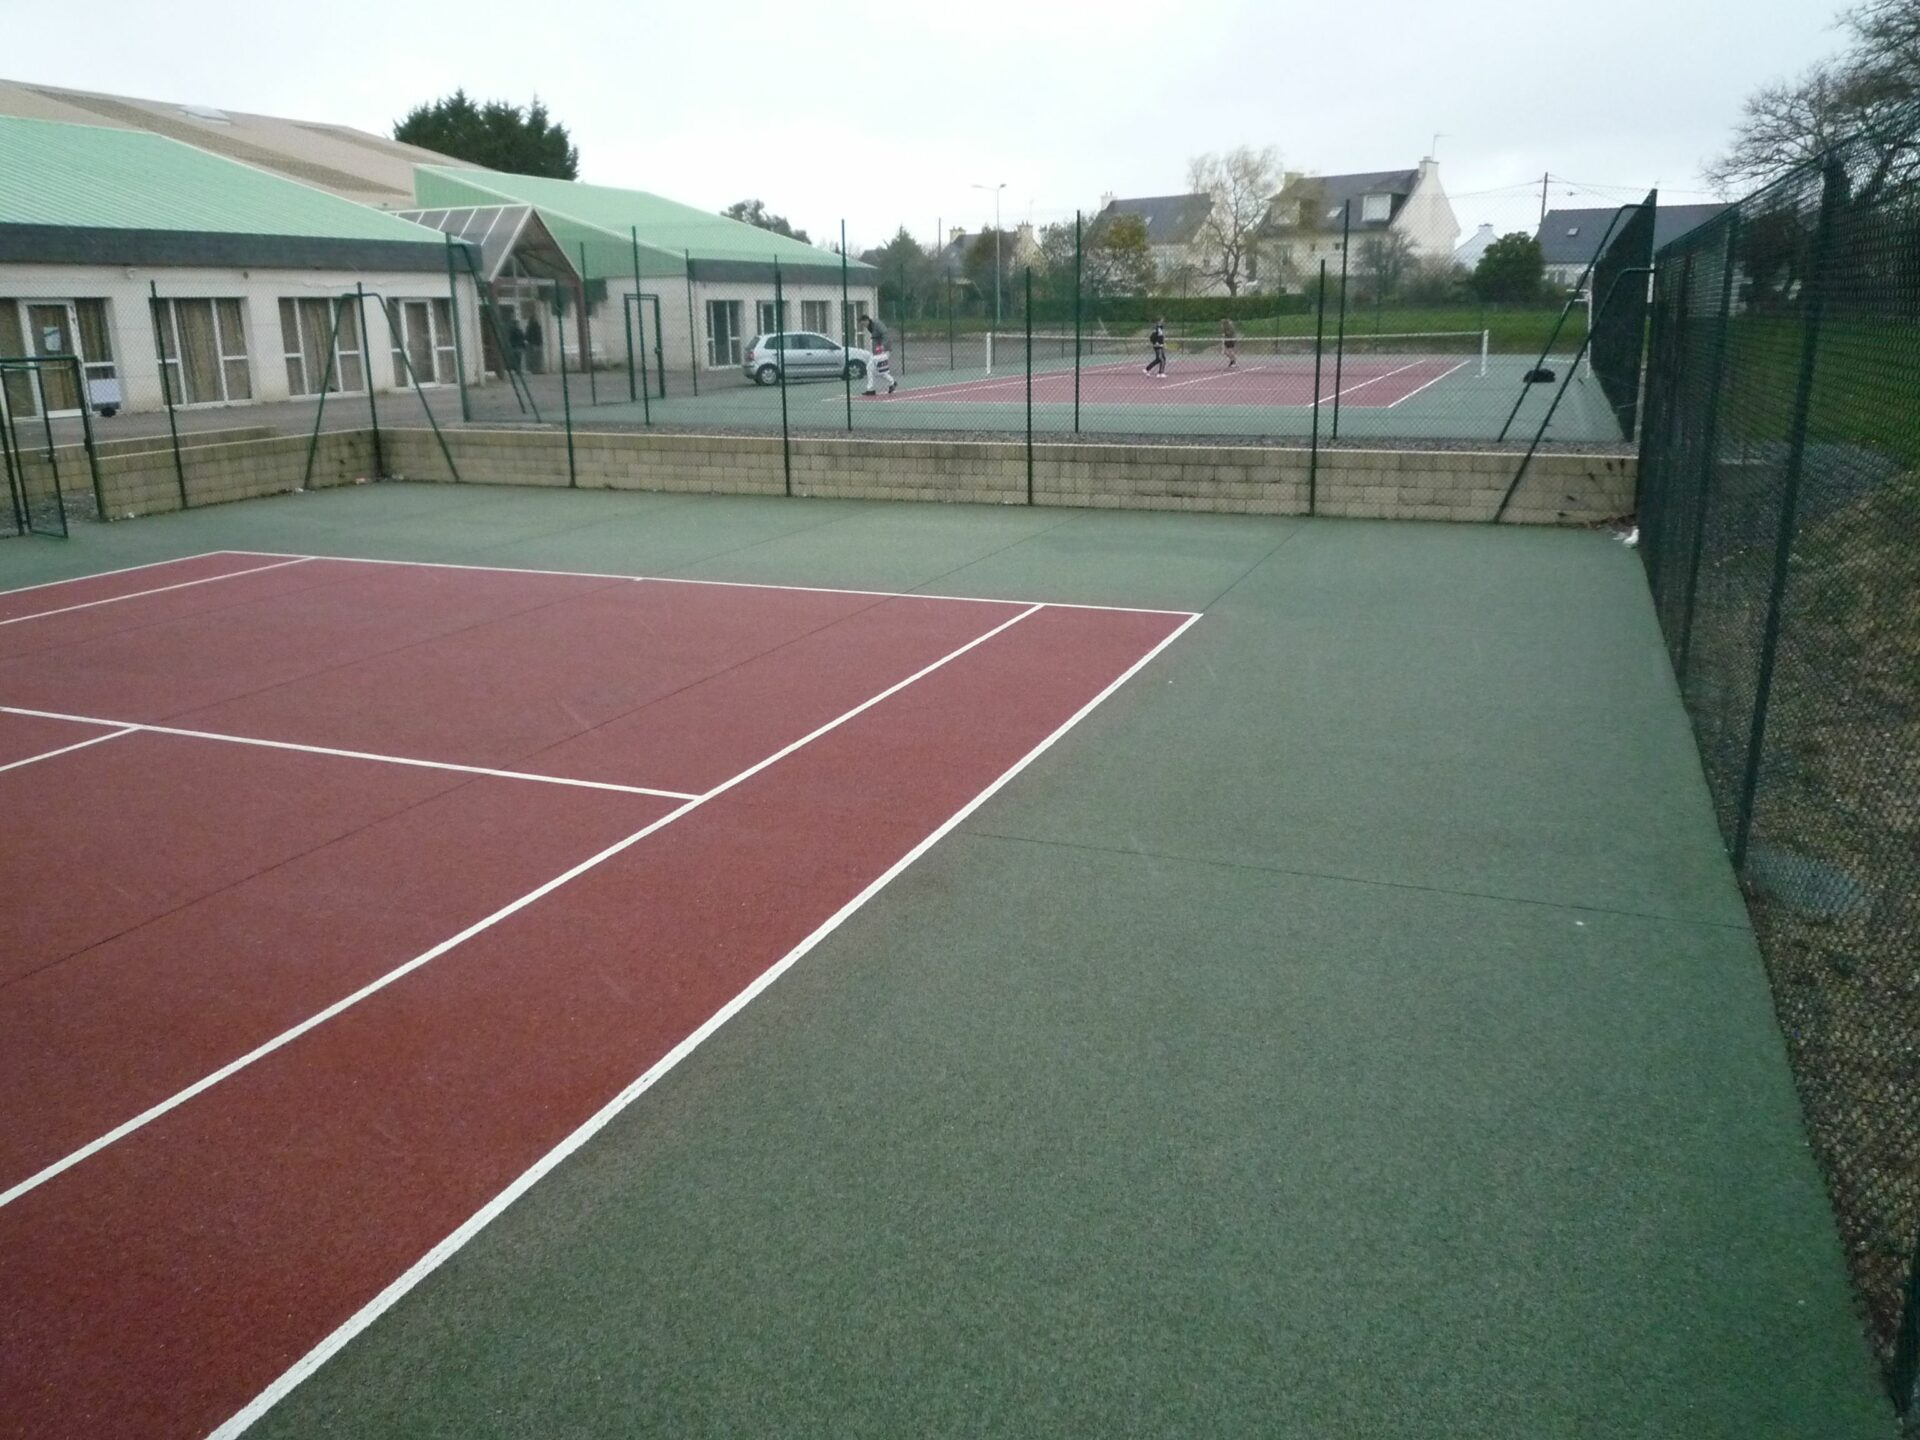 Tennis Club de Riec Sur Bélon